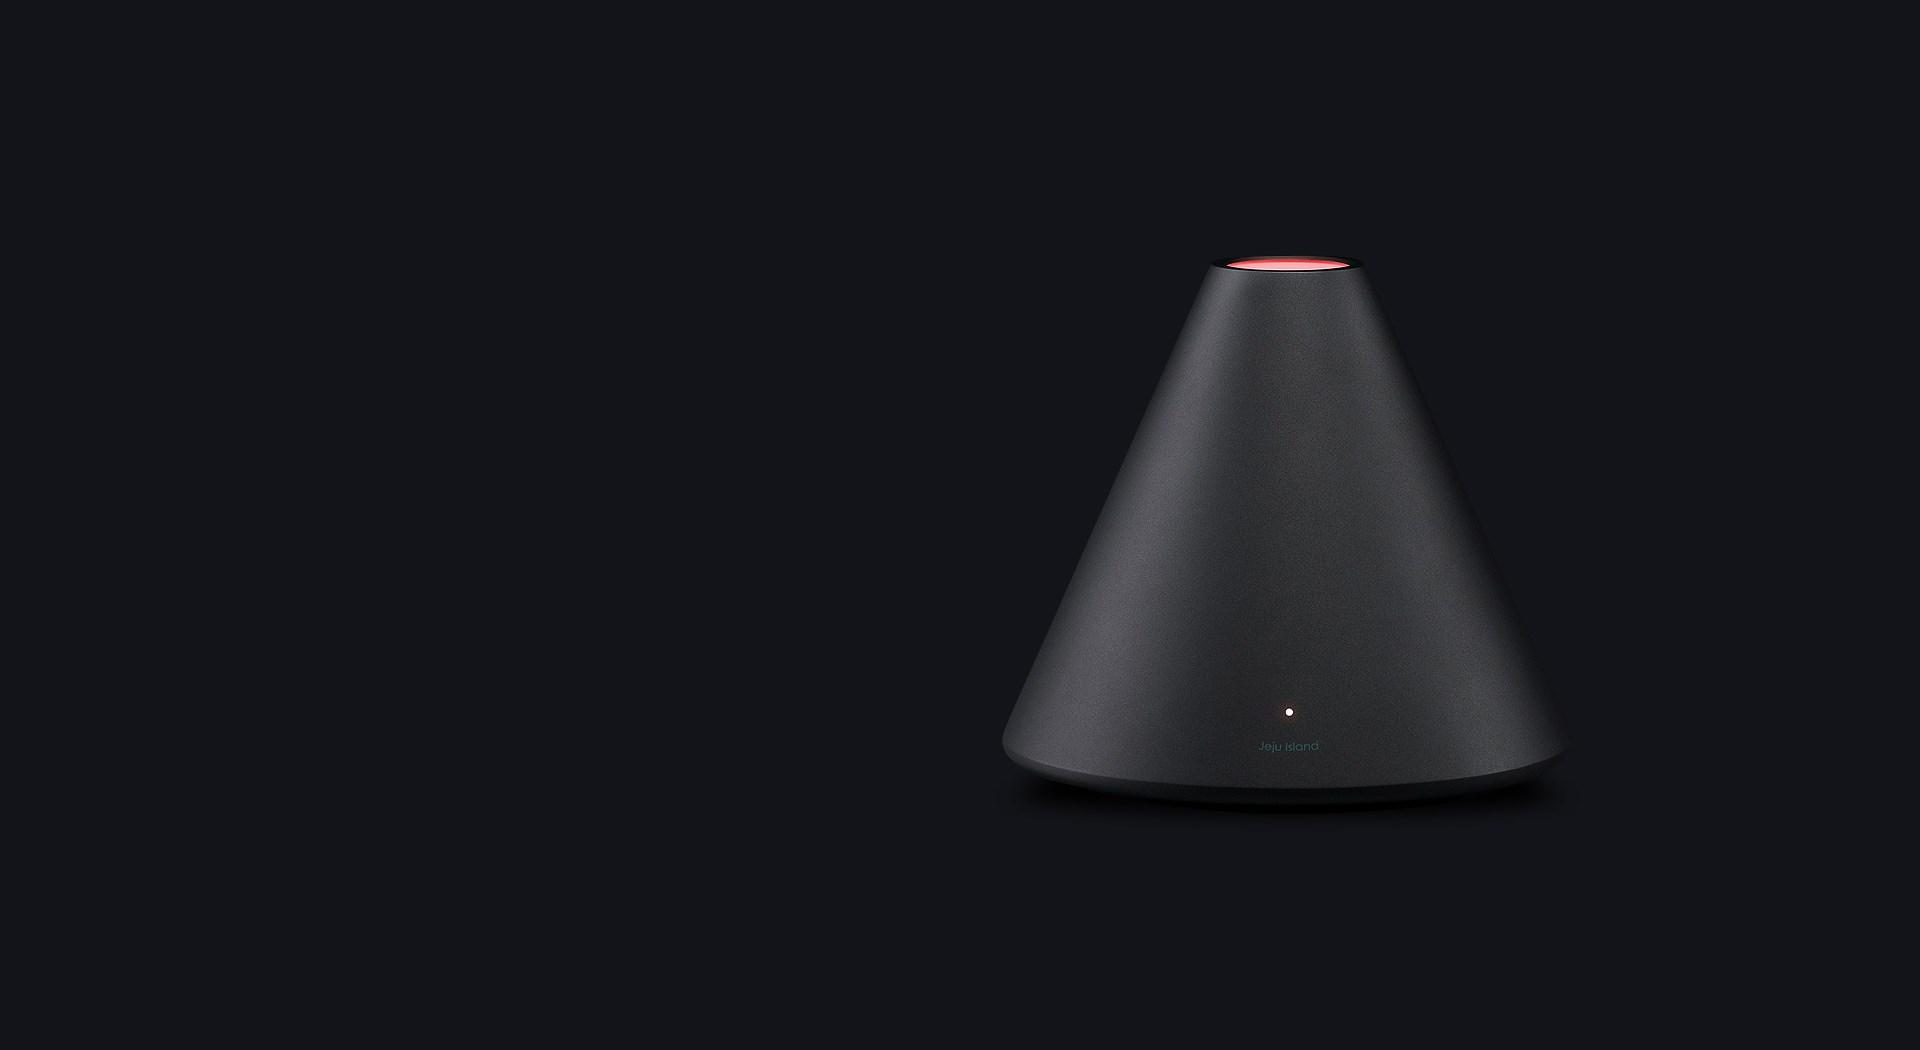 Dae-hoo Kim For users